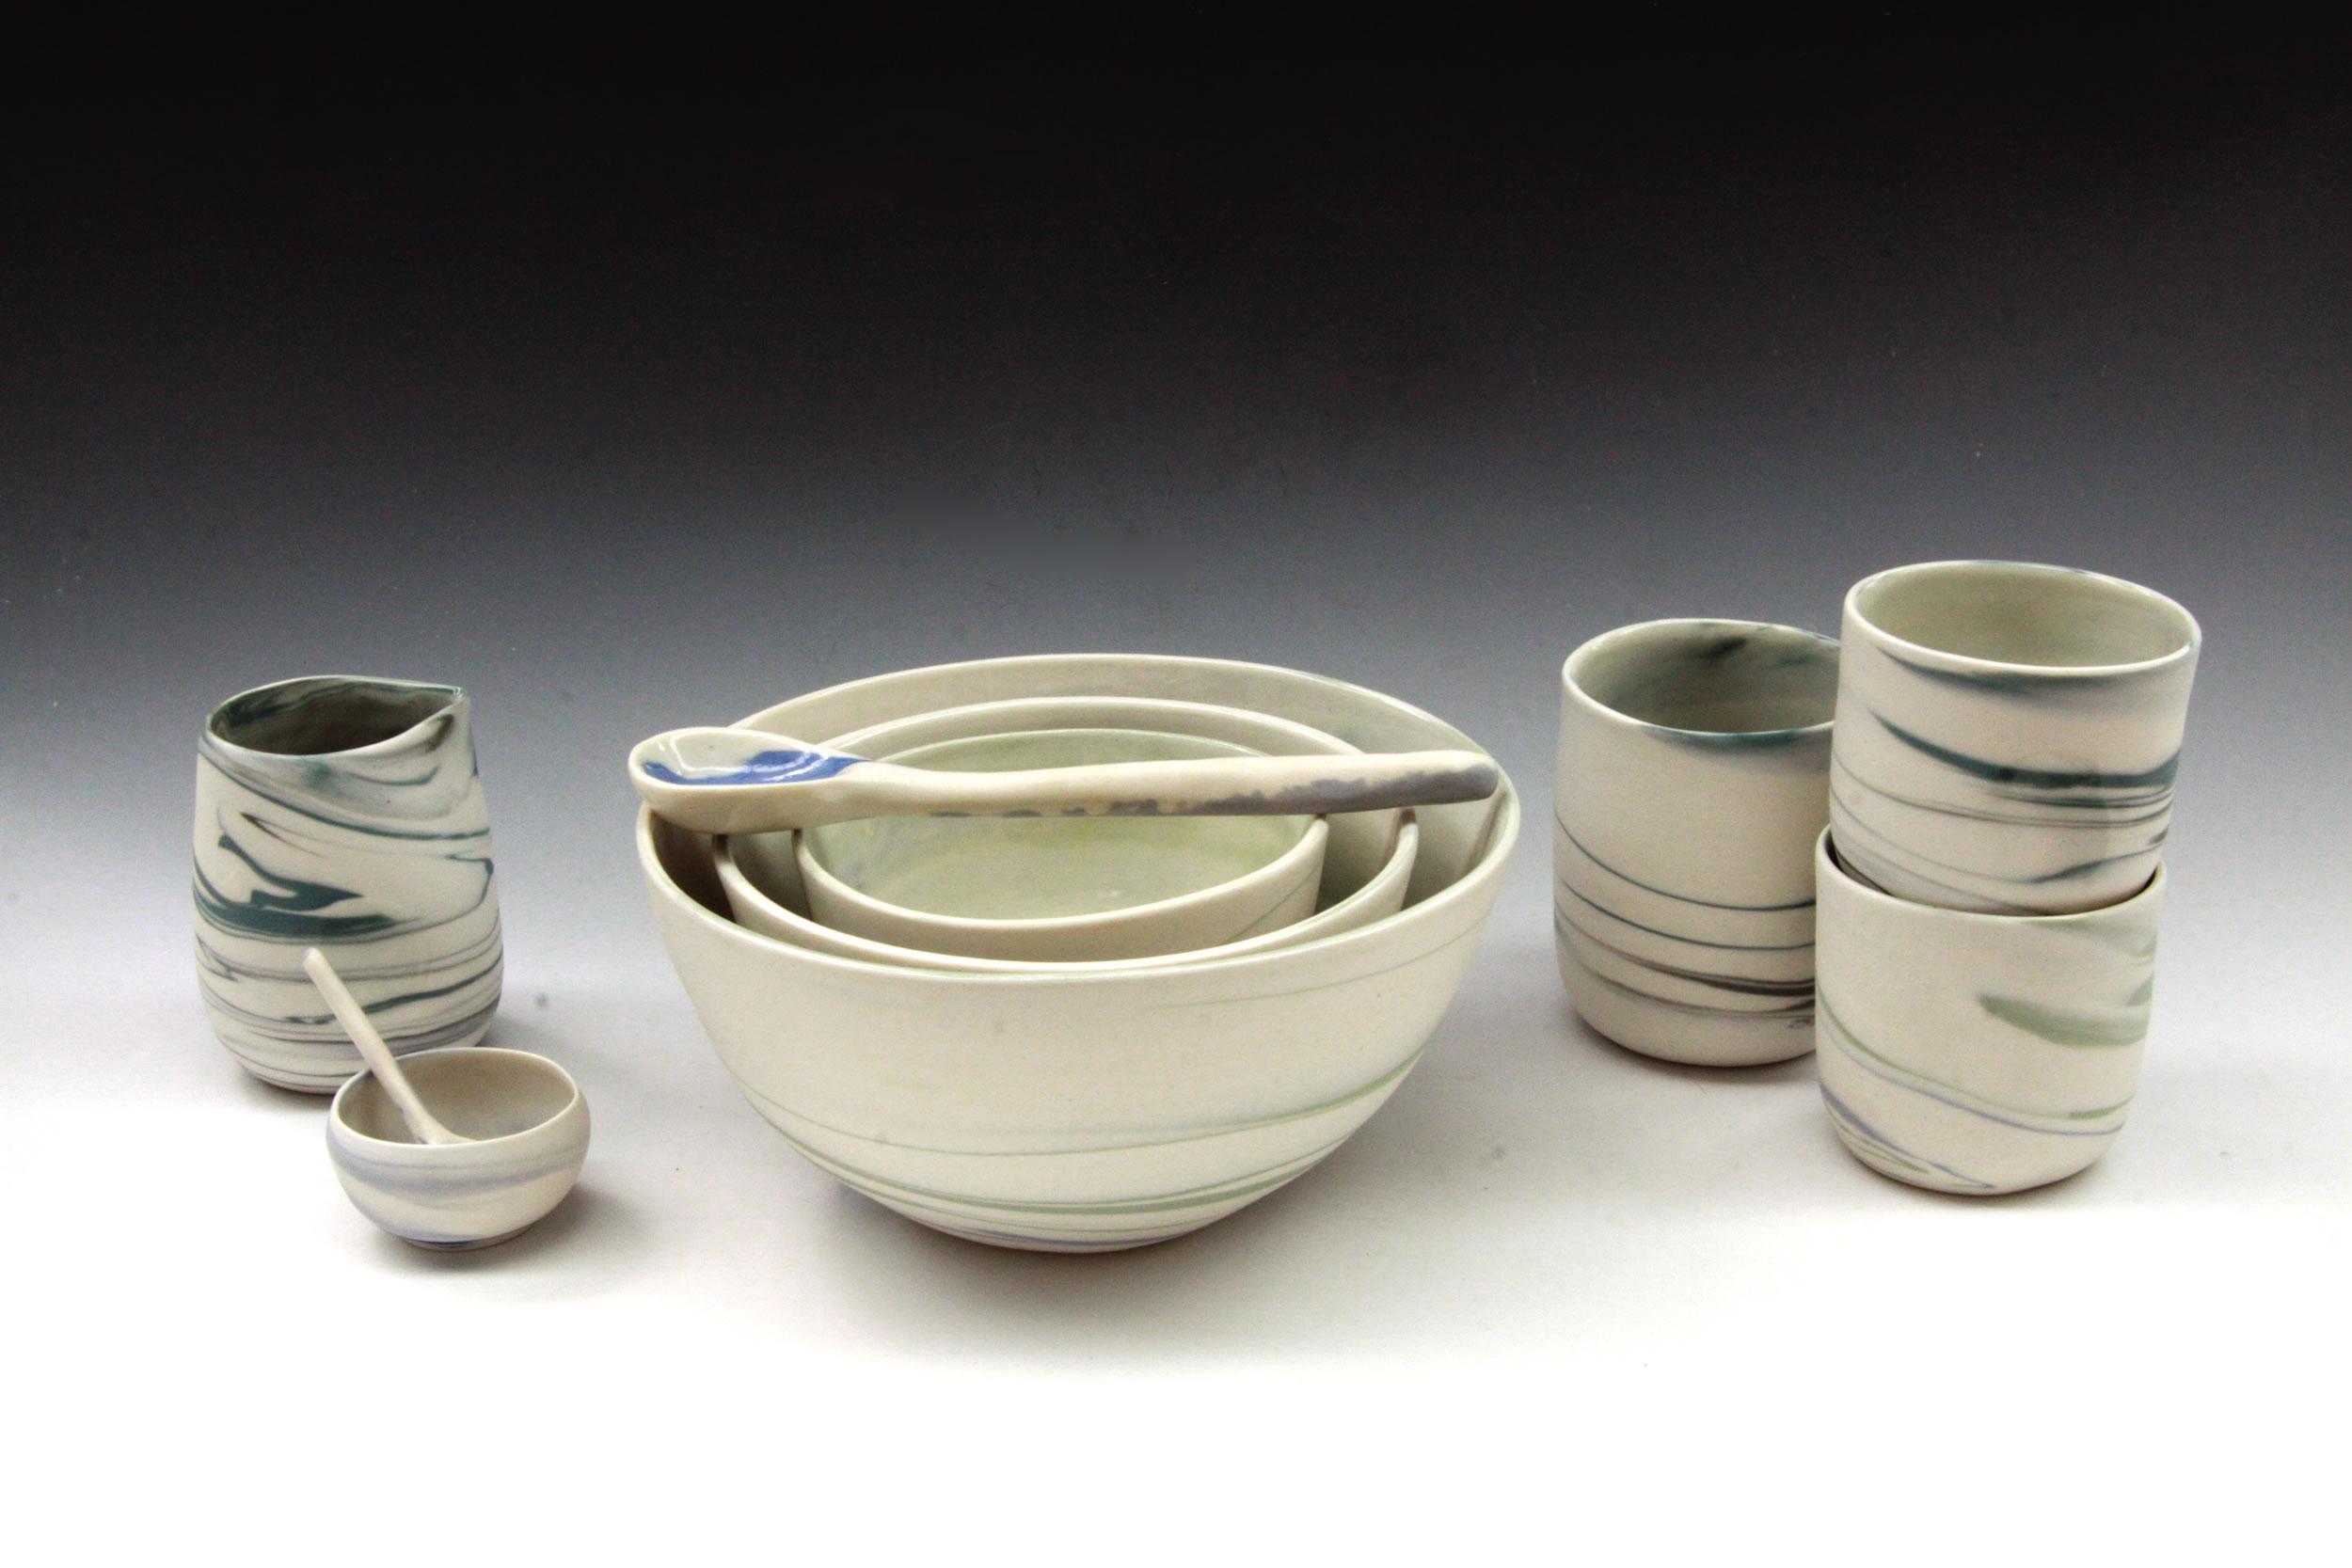 Handmade dining set, porcelain